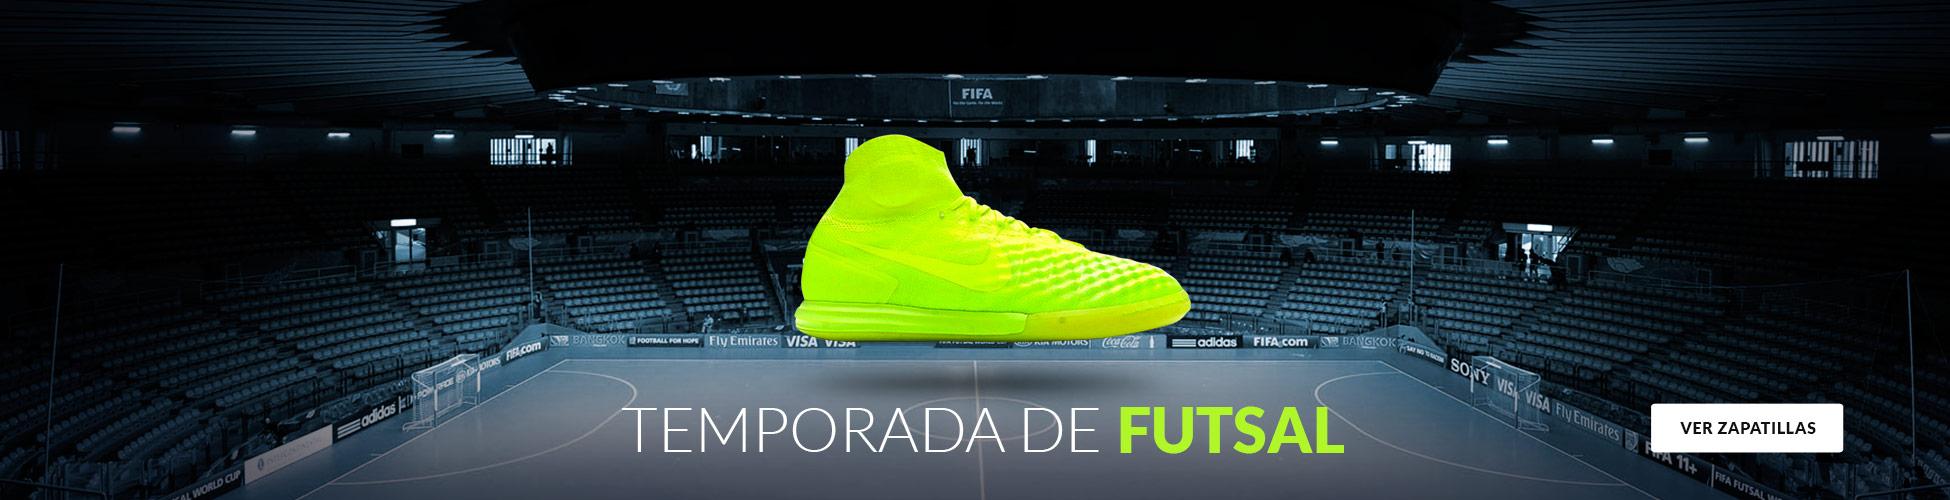 Temporada Futsal ES